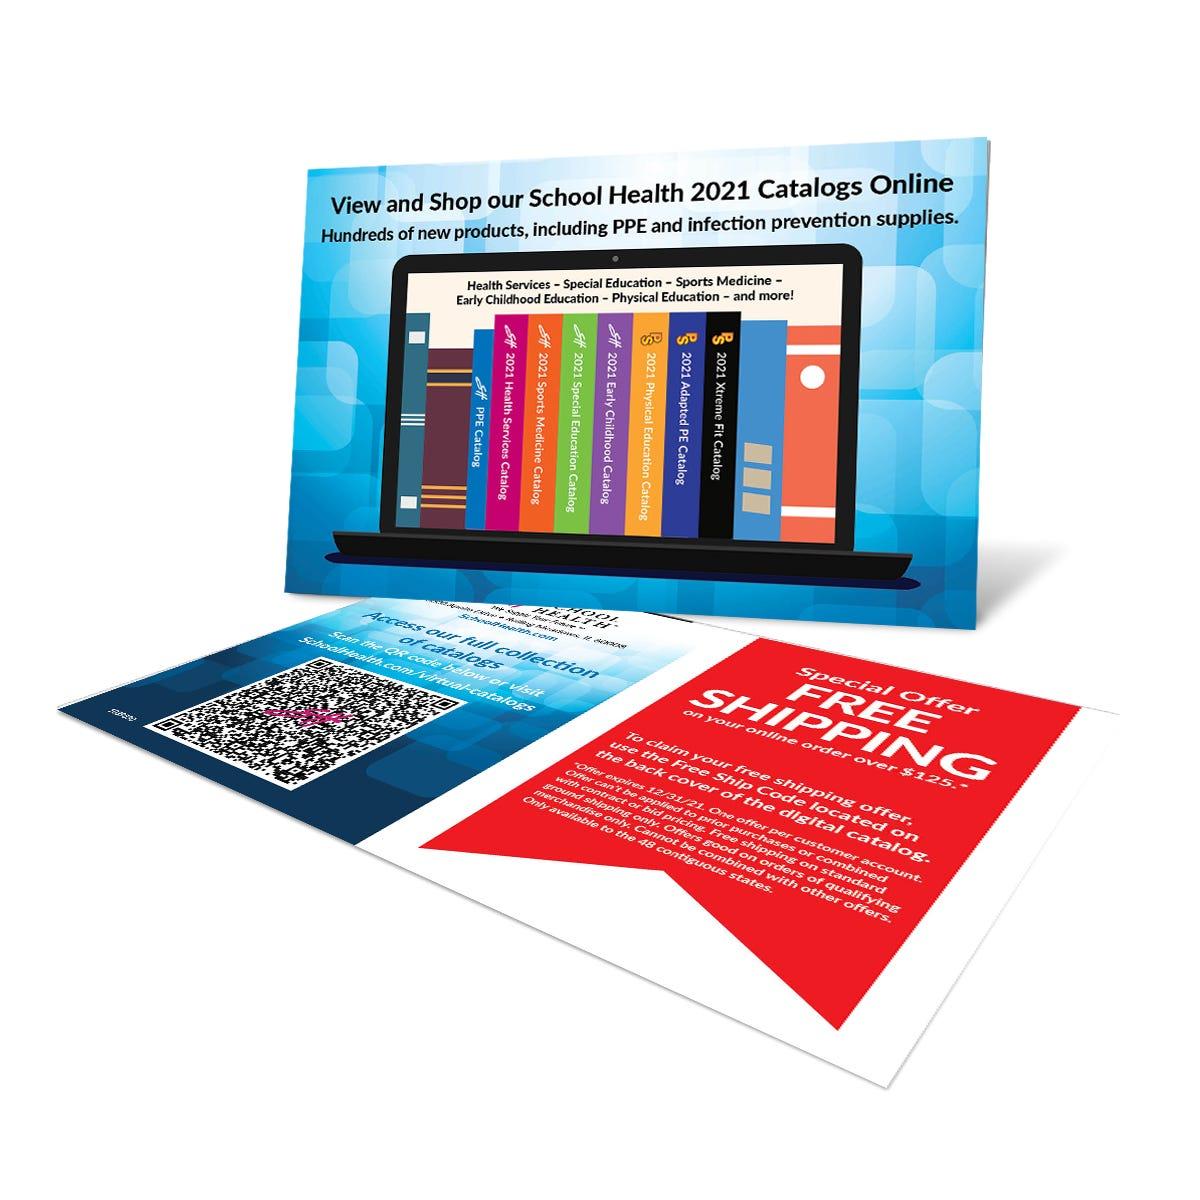 Tradeshow School Health 2021 Catalog